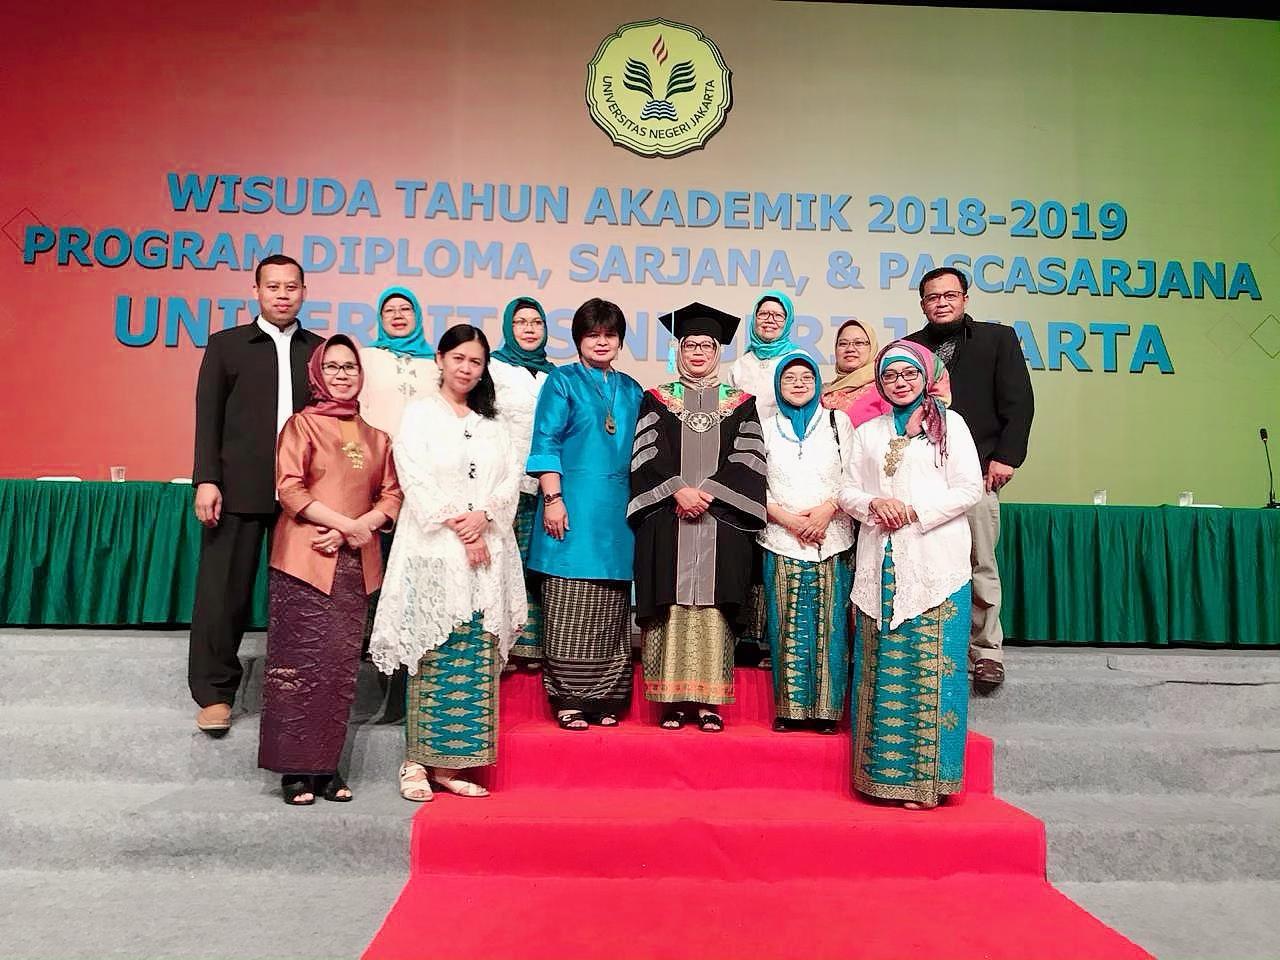 Wisuda Tahun Akademik 2018-2019 Program Diploma, Sarjana, dan Pascasarjana UNJ